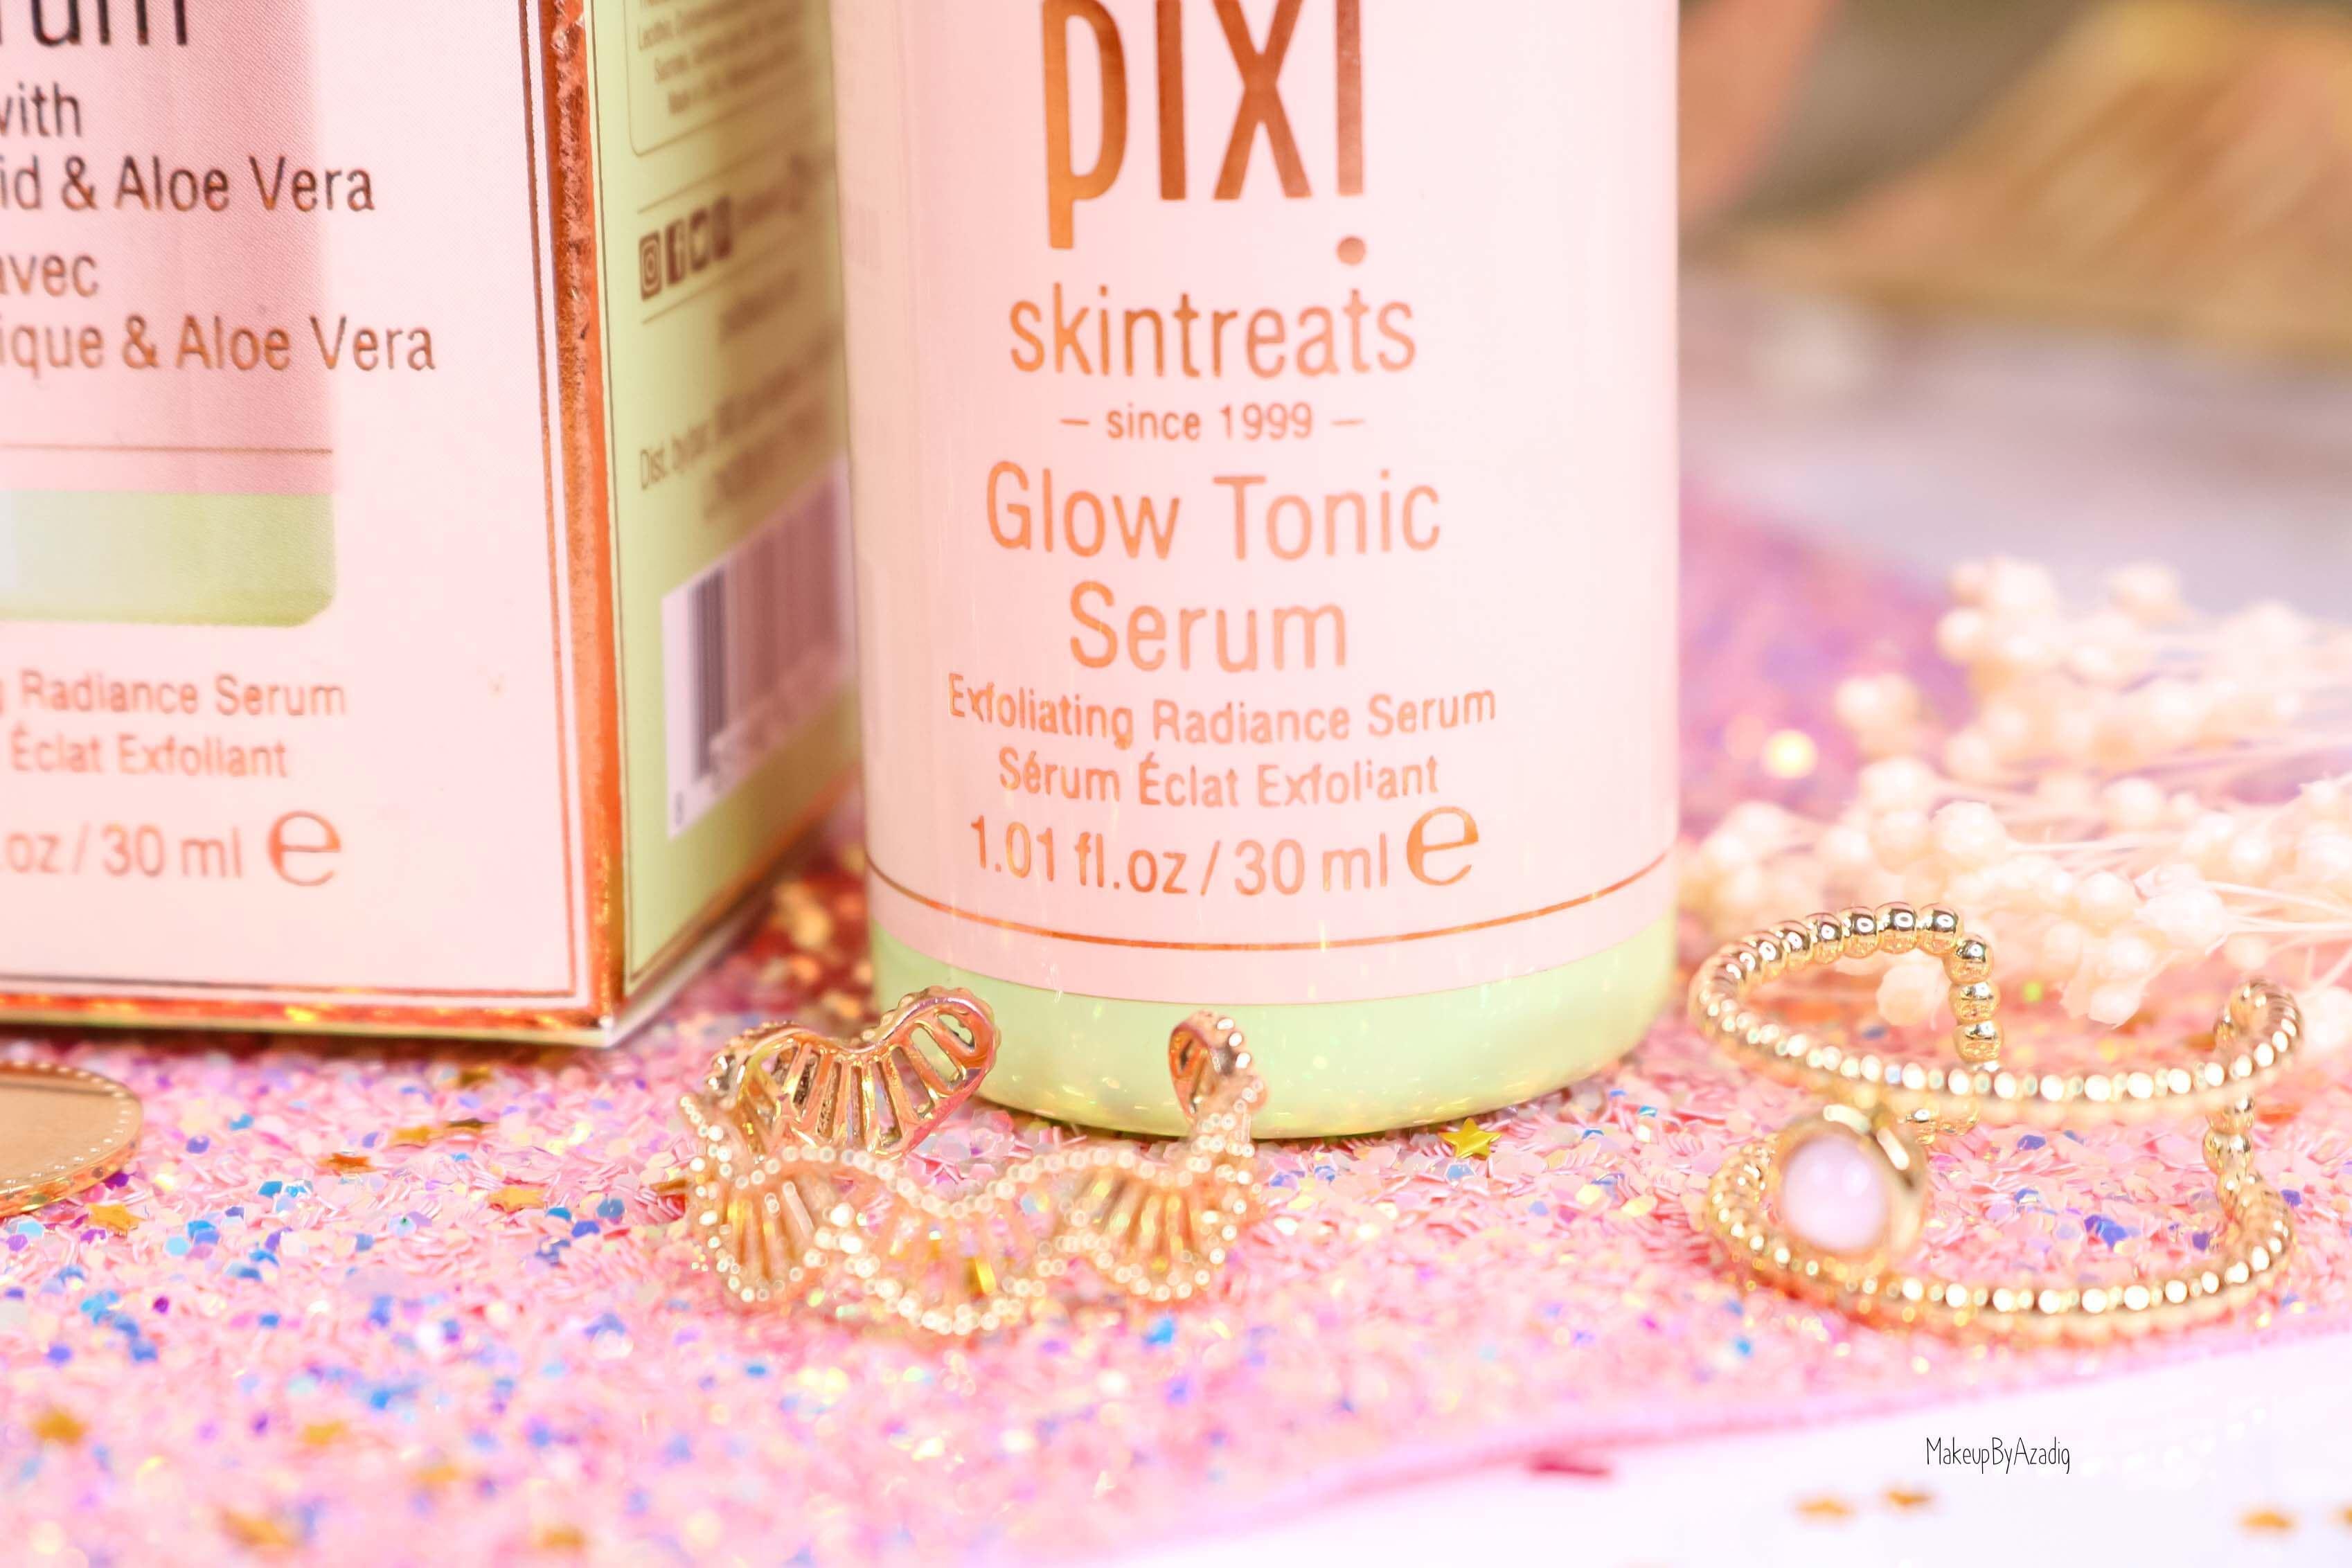 revue-routine-soin-skincare-pixi-beauty-visage-glow-tonic-serum-phenomenal-gel-aloe-vera-makeupbyazadig-sephora-avis-prix-eclat